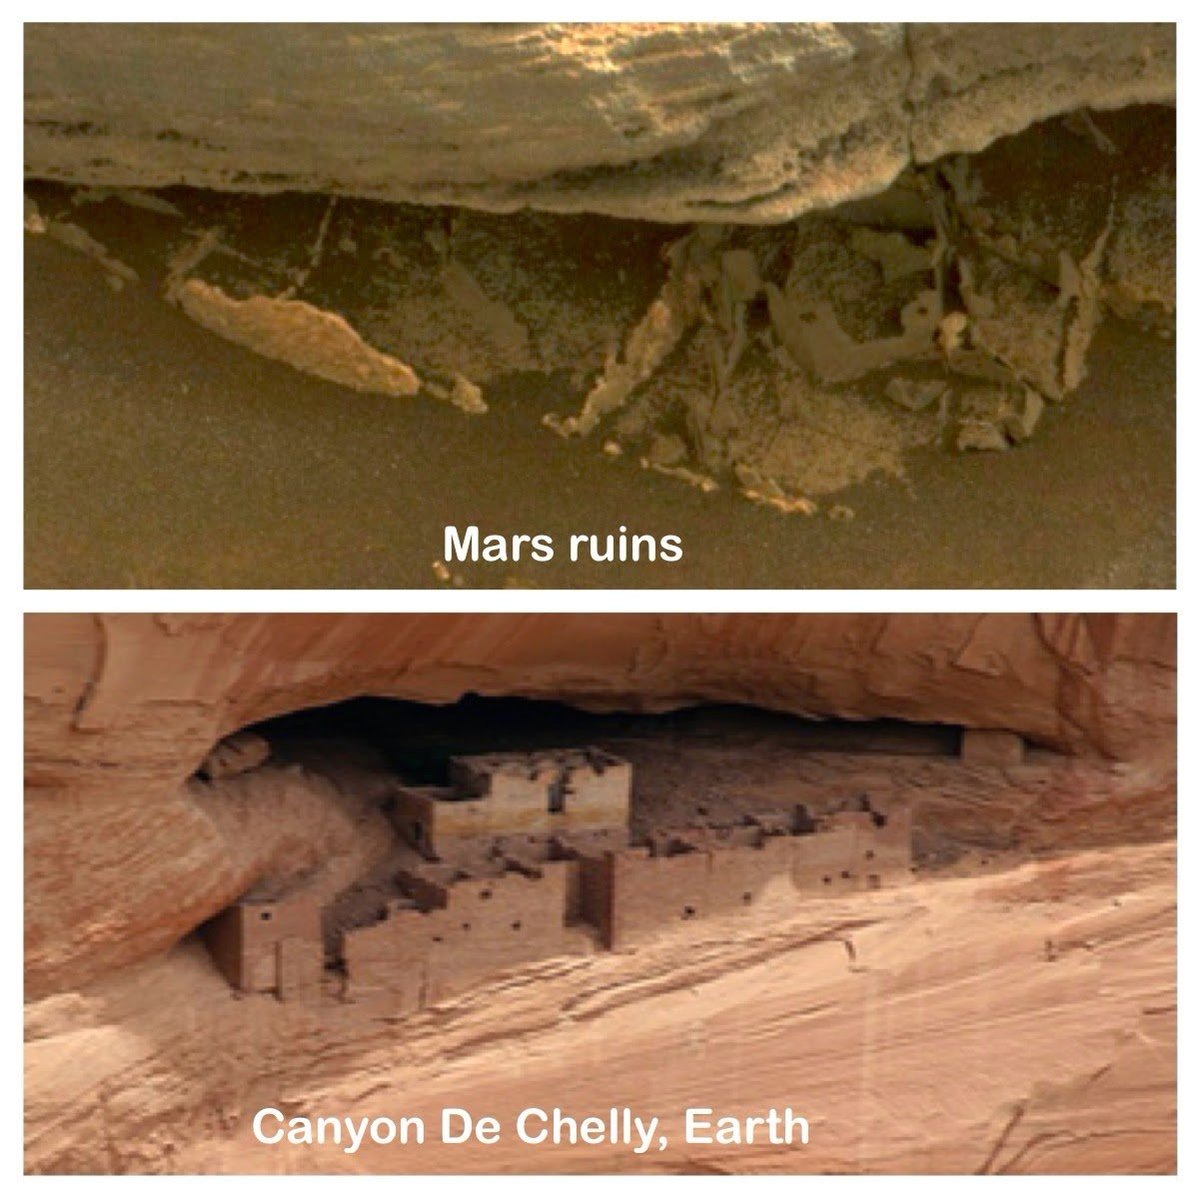 Anunnaki&#39;s Mars Structures  #nibiru #planetx #marduk #anunnaki #amonra #Elysium #Cydonia #shafakgokturk  #anunnakieverywhere  #adamspeak #anunnaki_theory #stones #Mars<br>http://pic.twitter.com/65qflGl1Wf